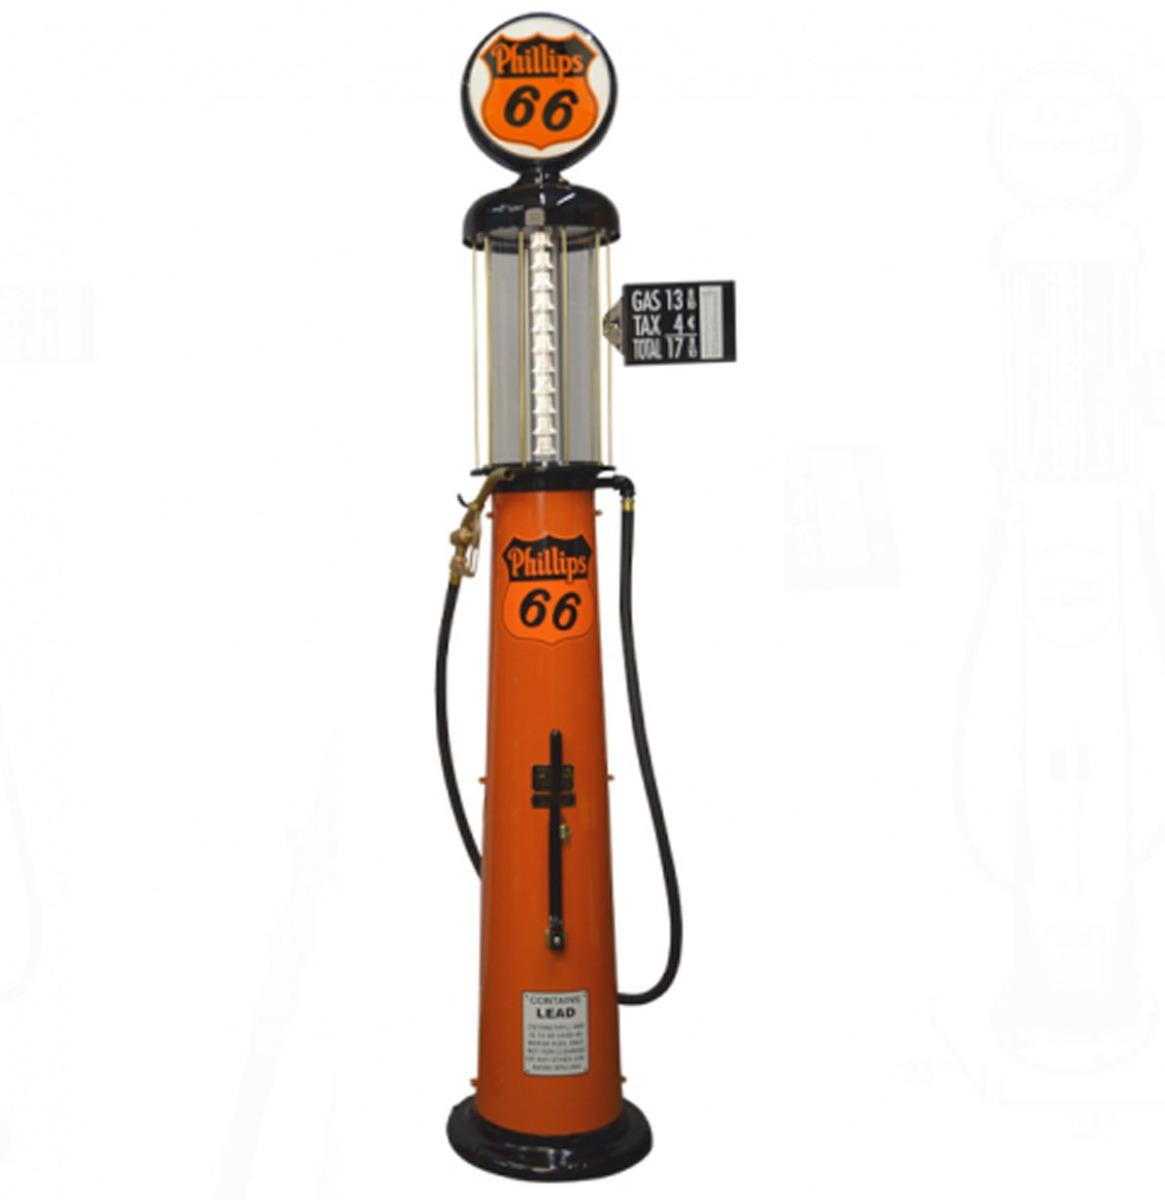 Wayne 615 Phillips 66 10 Gallon Benzinepomp - Oranje & Zwart - Reproductie